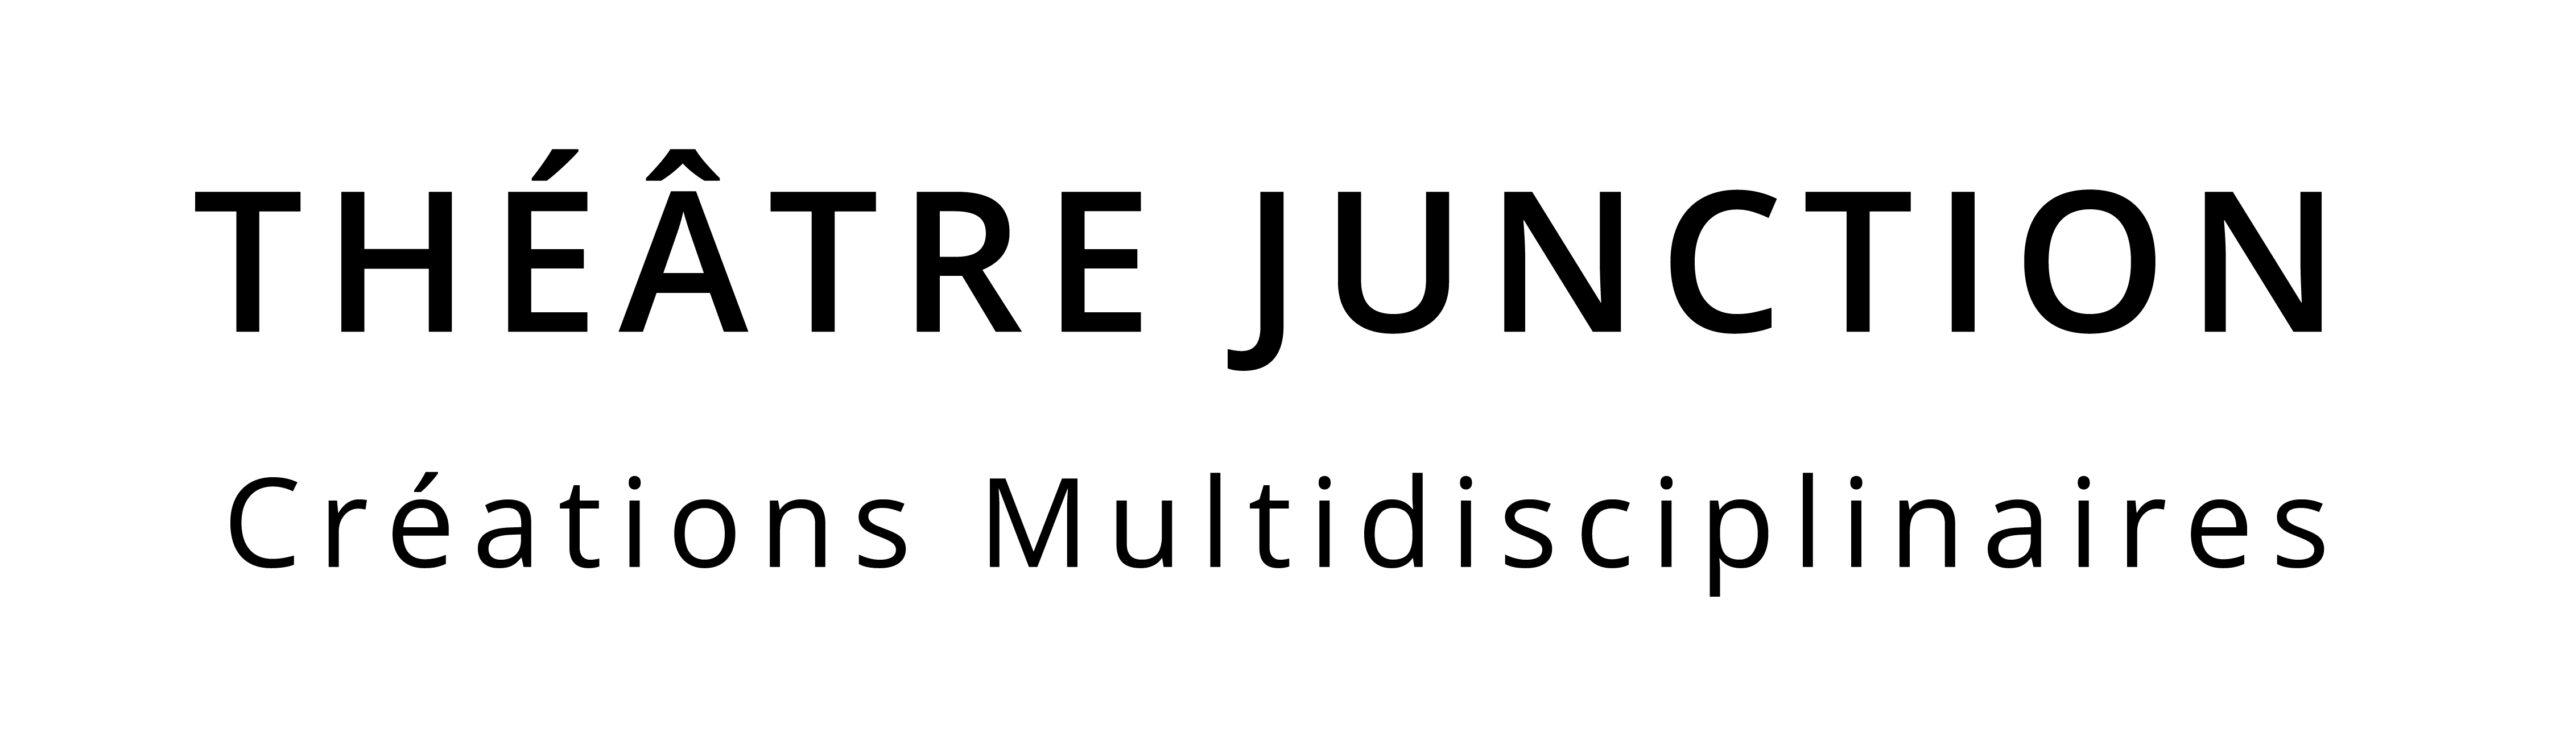 Théatre Junction